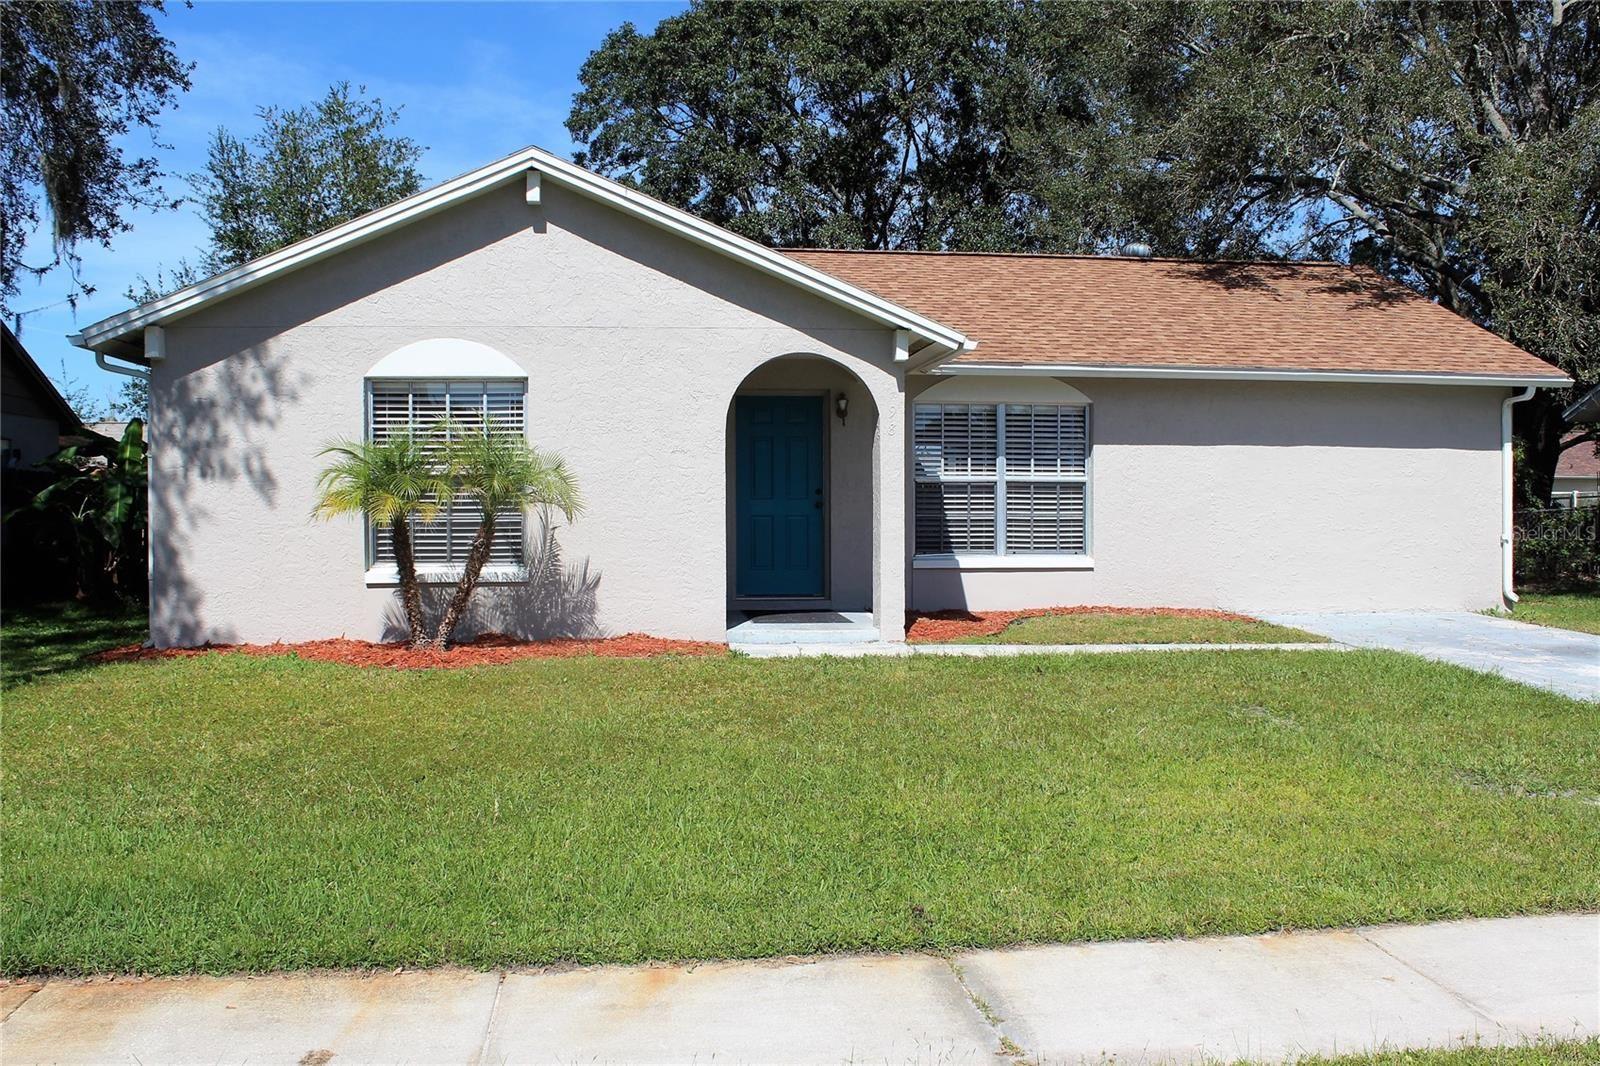 7982 GRISWOLD LOOP, New Port Richey, FL 34655 - MLS#: W7839146